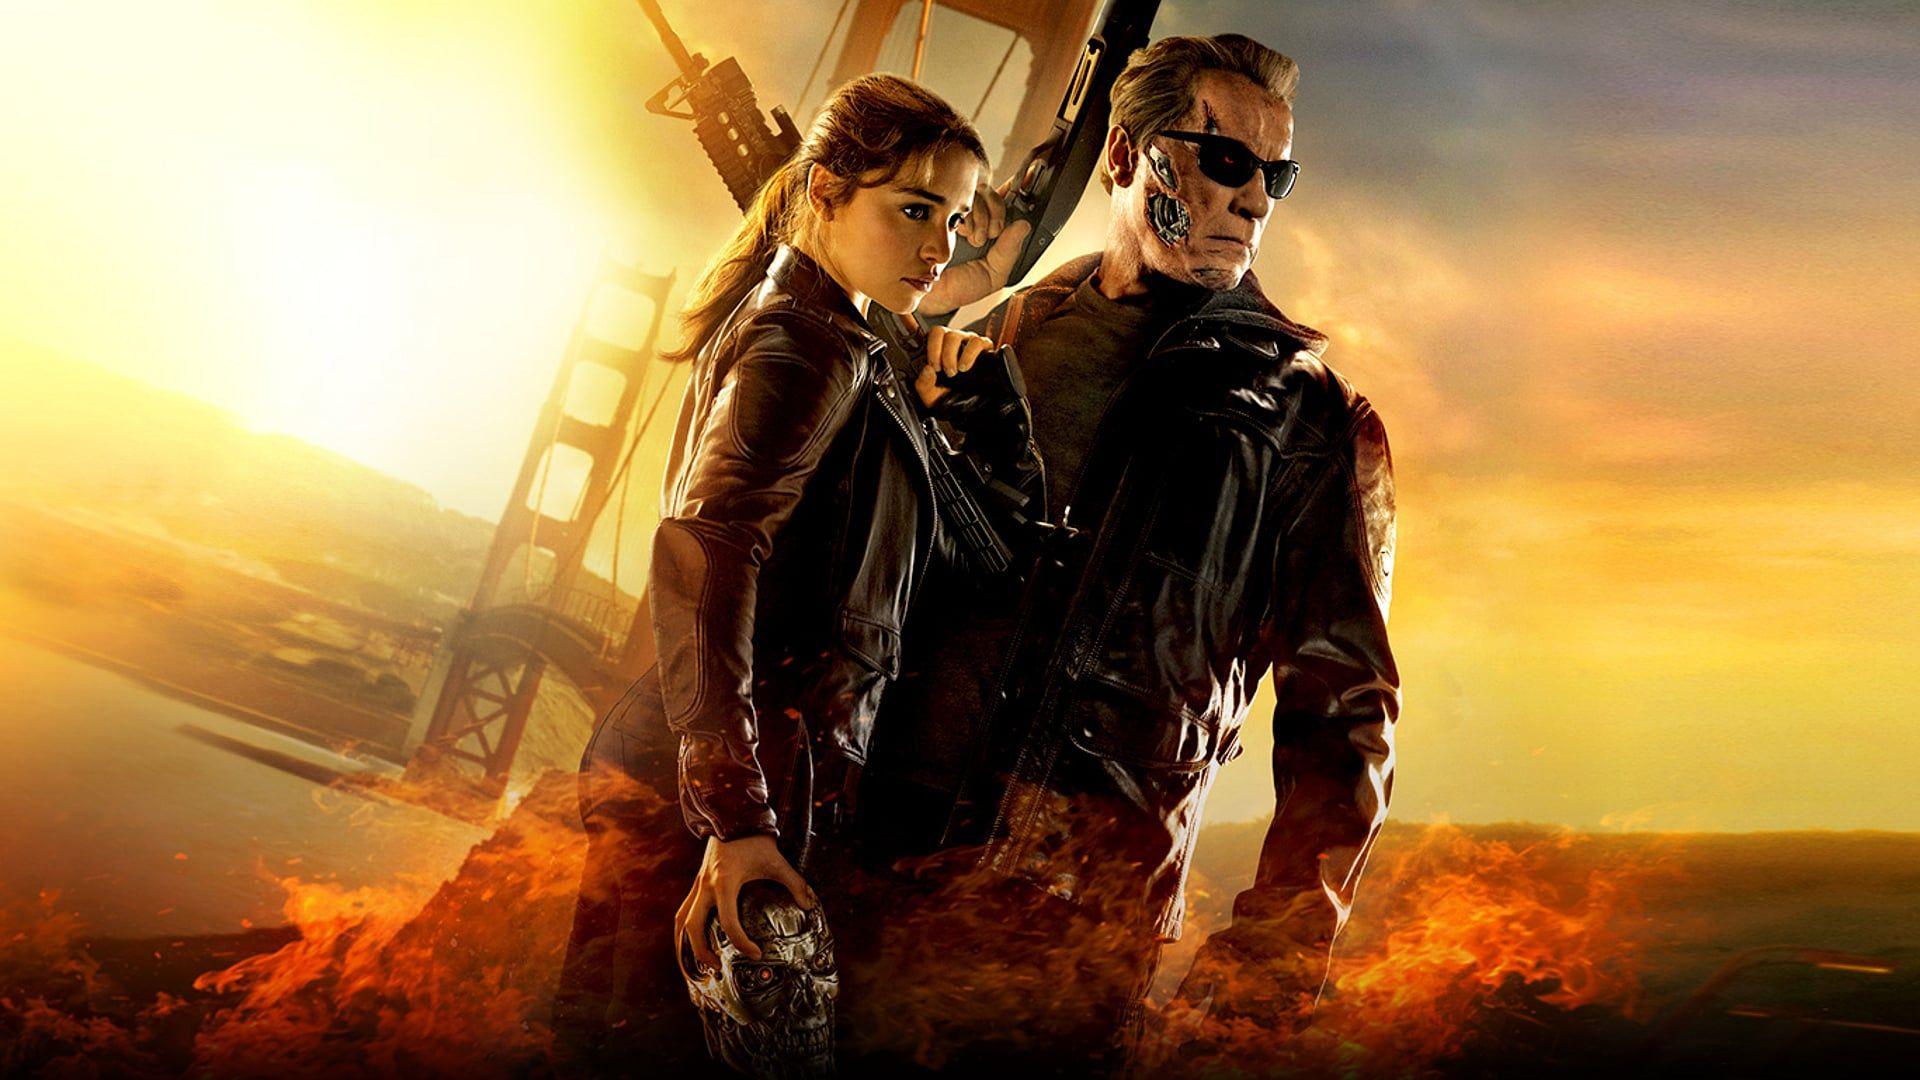 Terminator Genisys 2015 Streaming Ita Cb01 Film Completo Cinema Guarda Terminator Genisys Italiano Terminator Genisys Terminator Free Movies Online